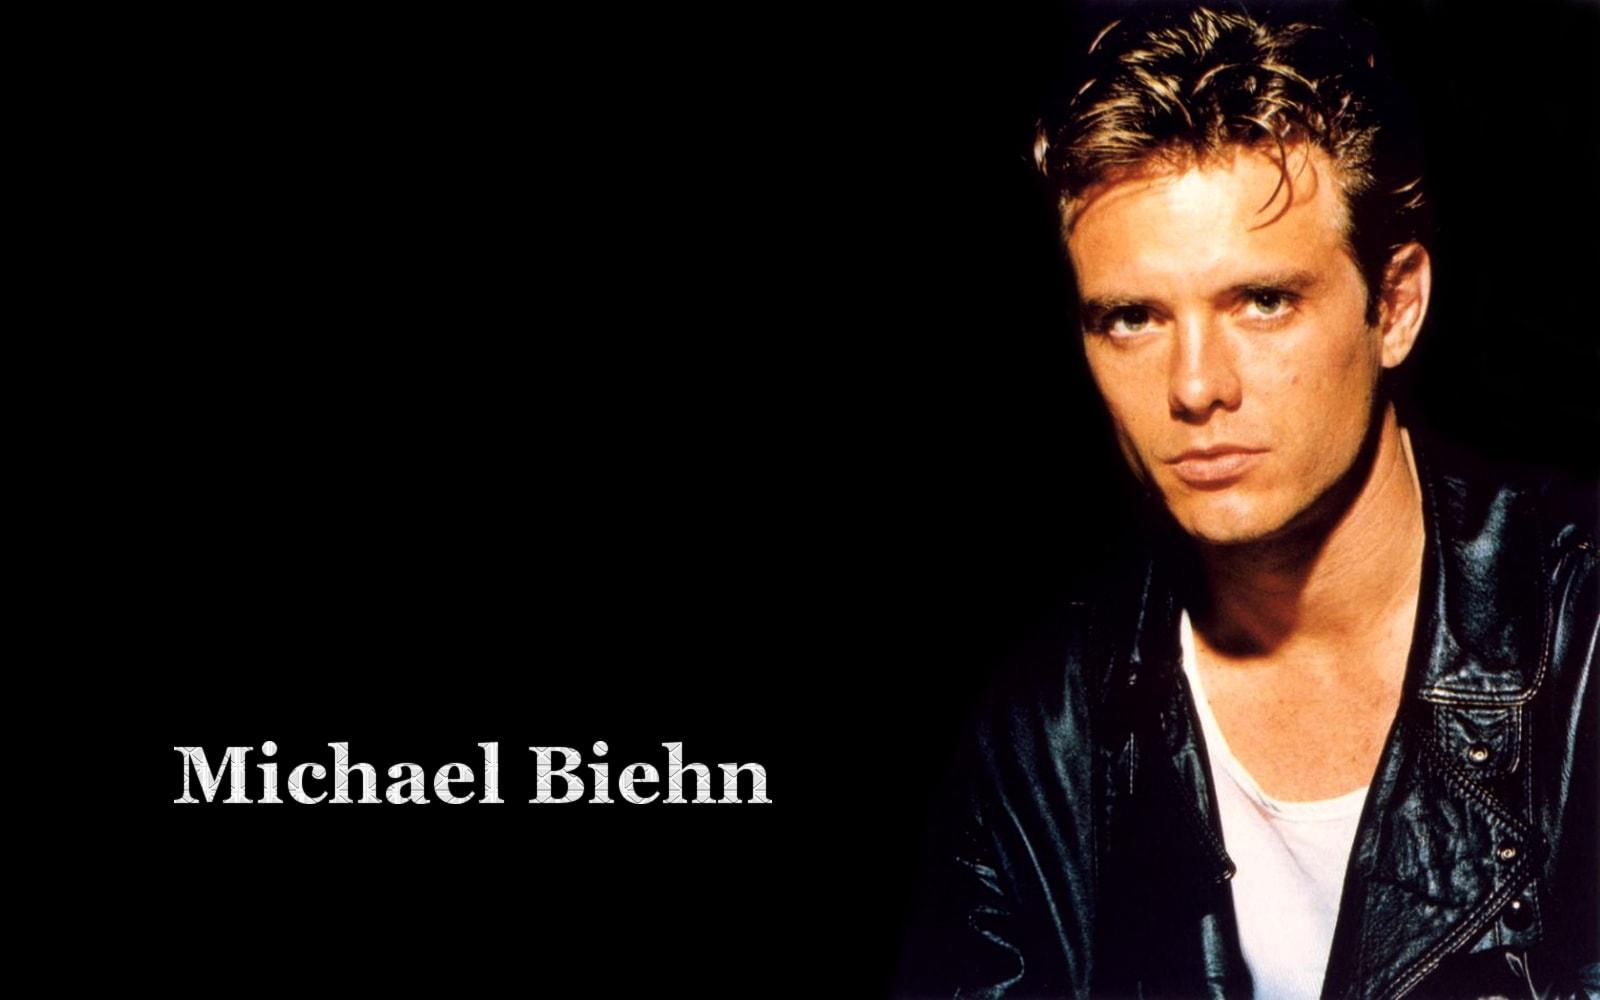 Michael Biehn Full hd wallpapers